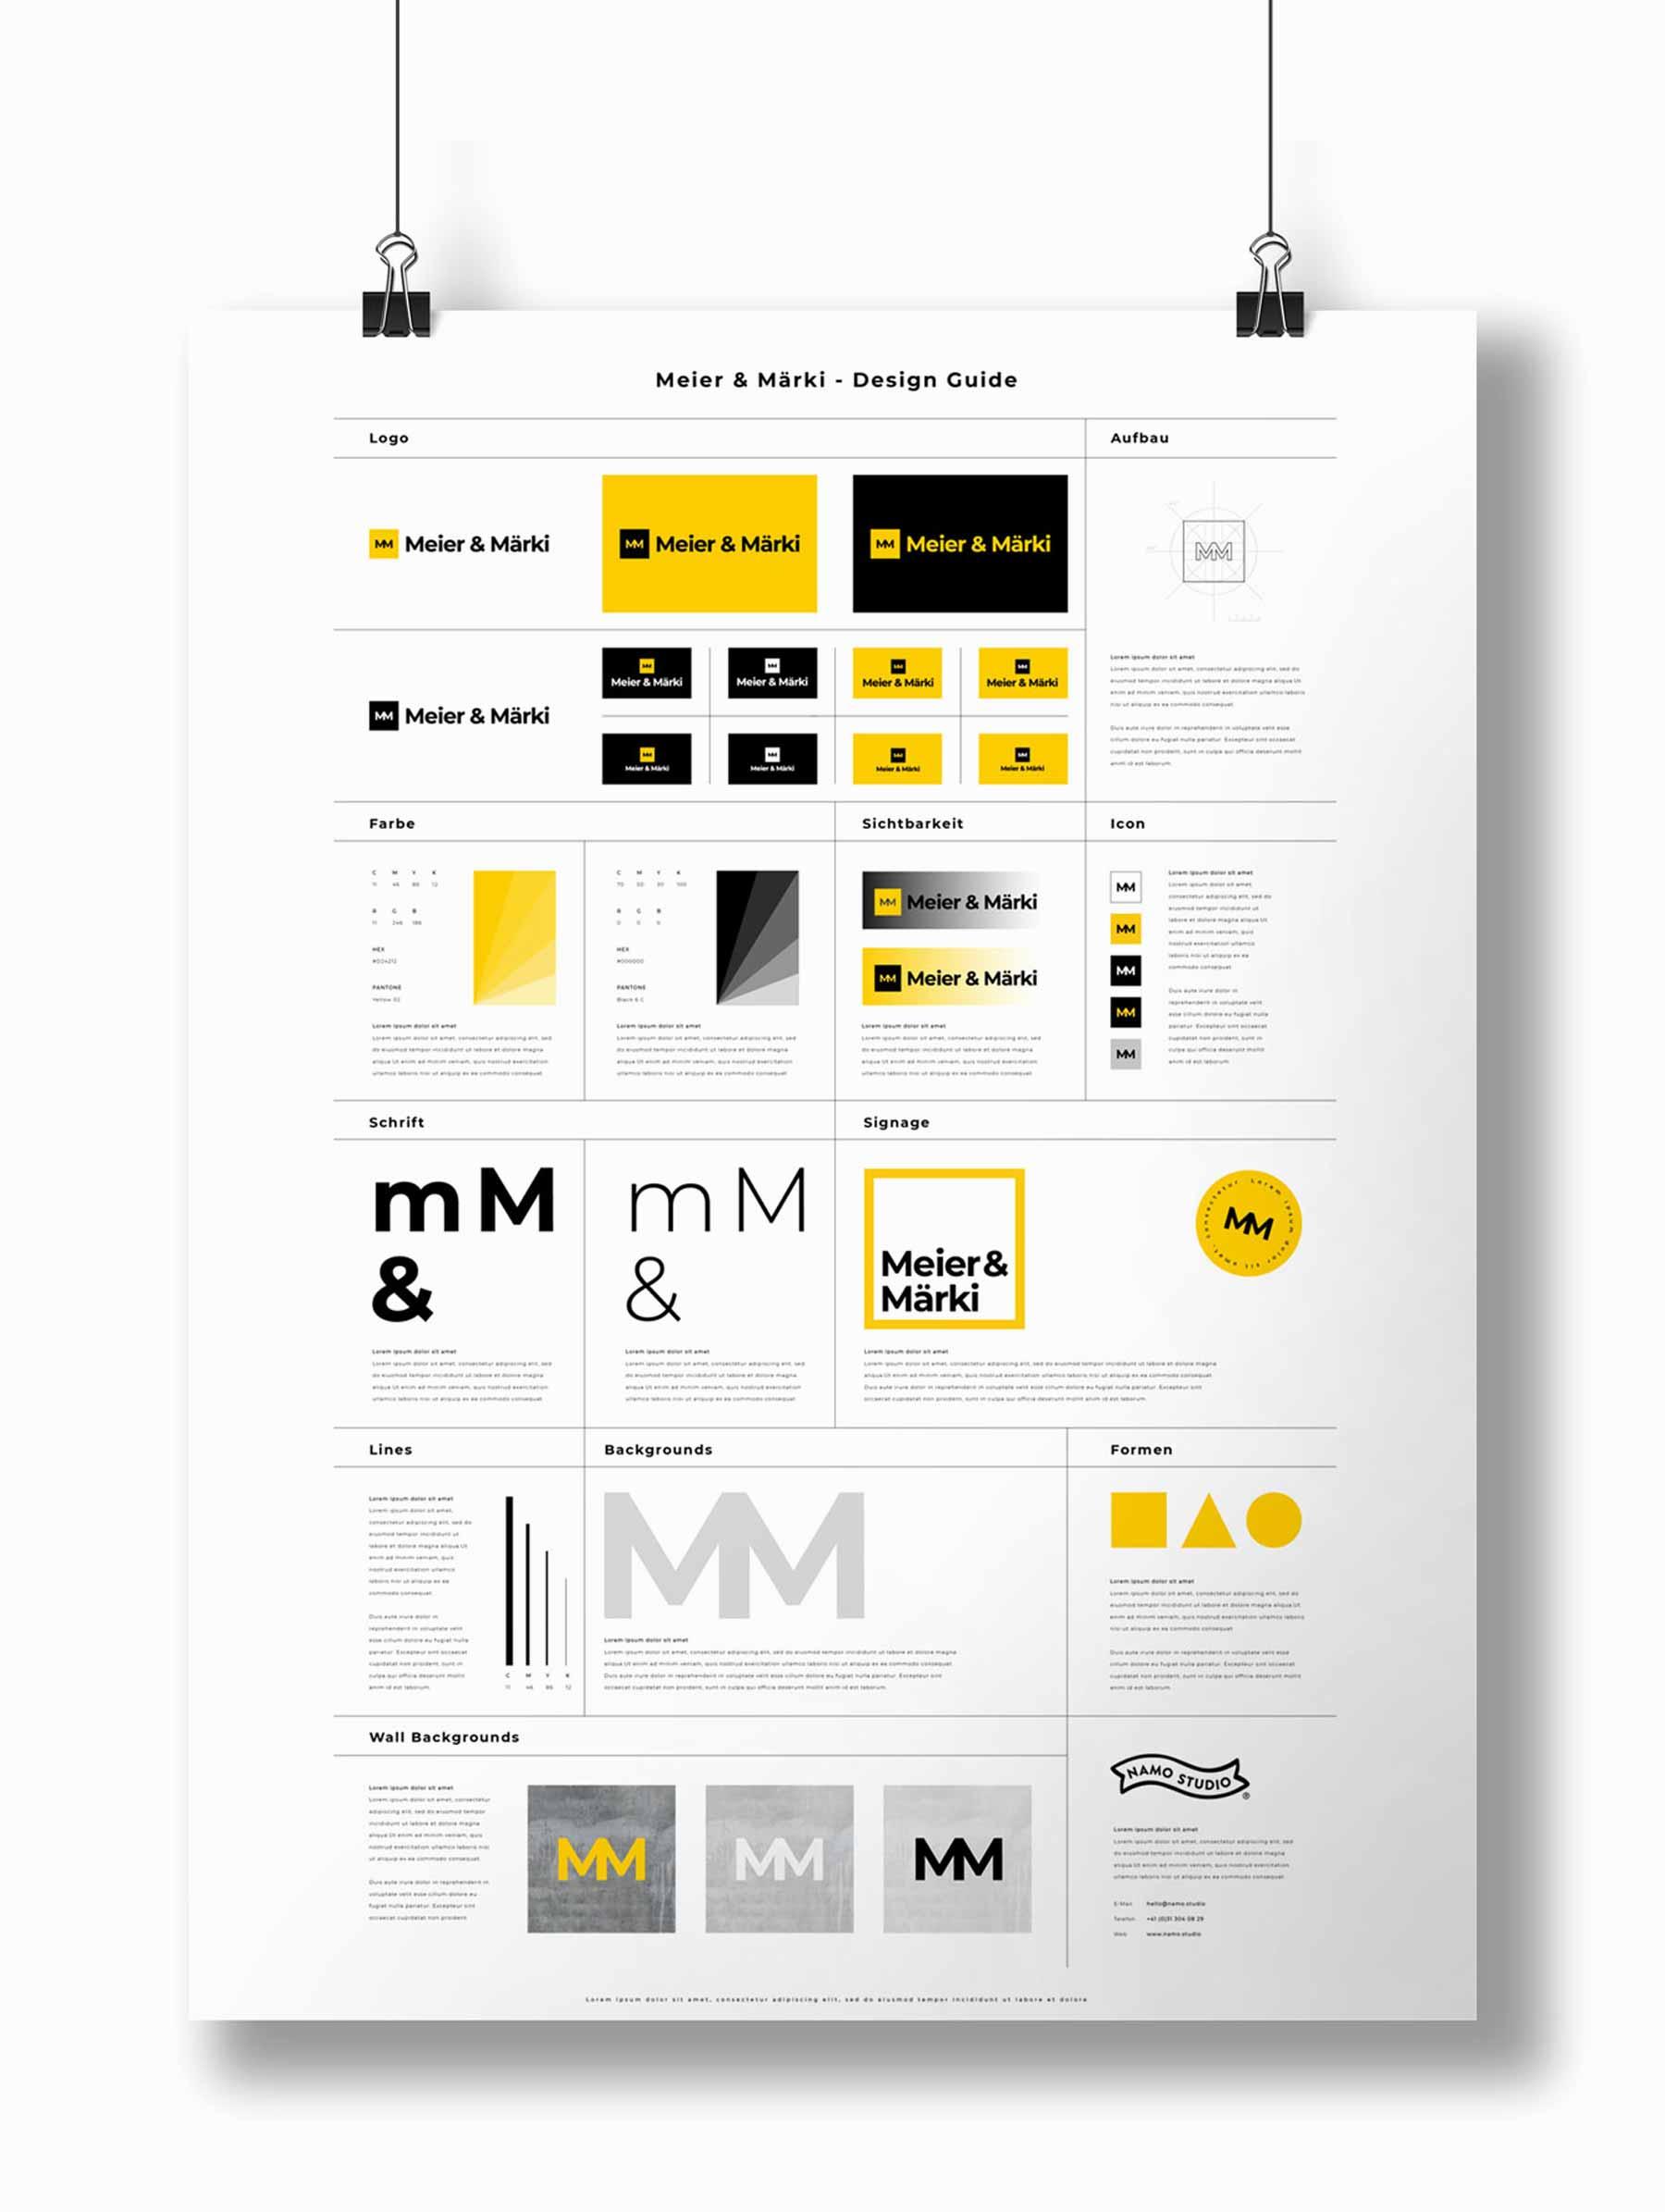 Design Guide CI/CD Marke Kanzlei Schweiz